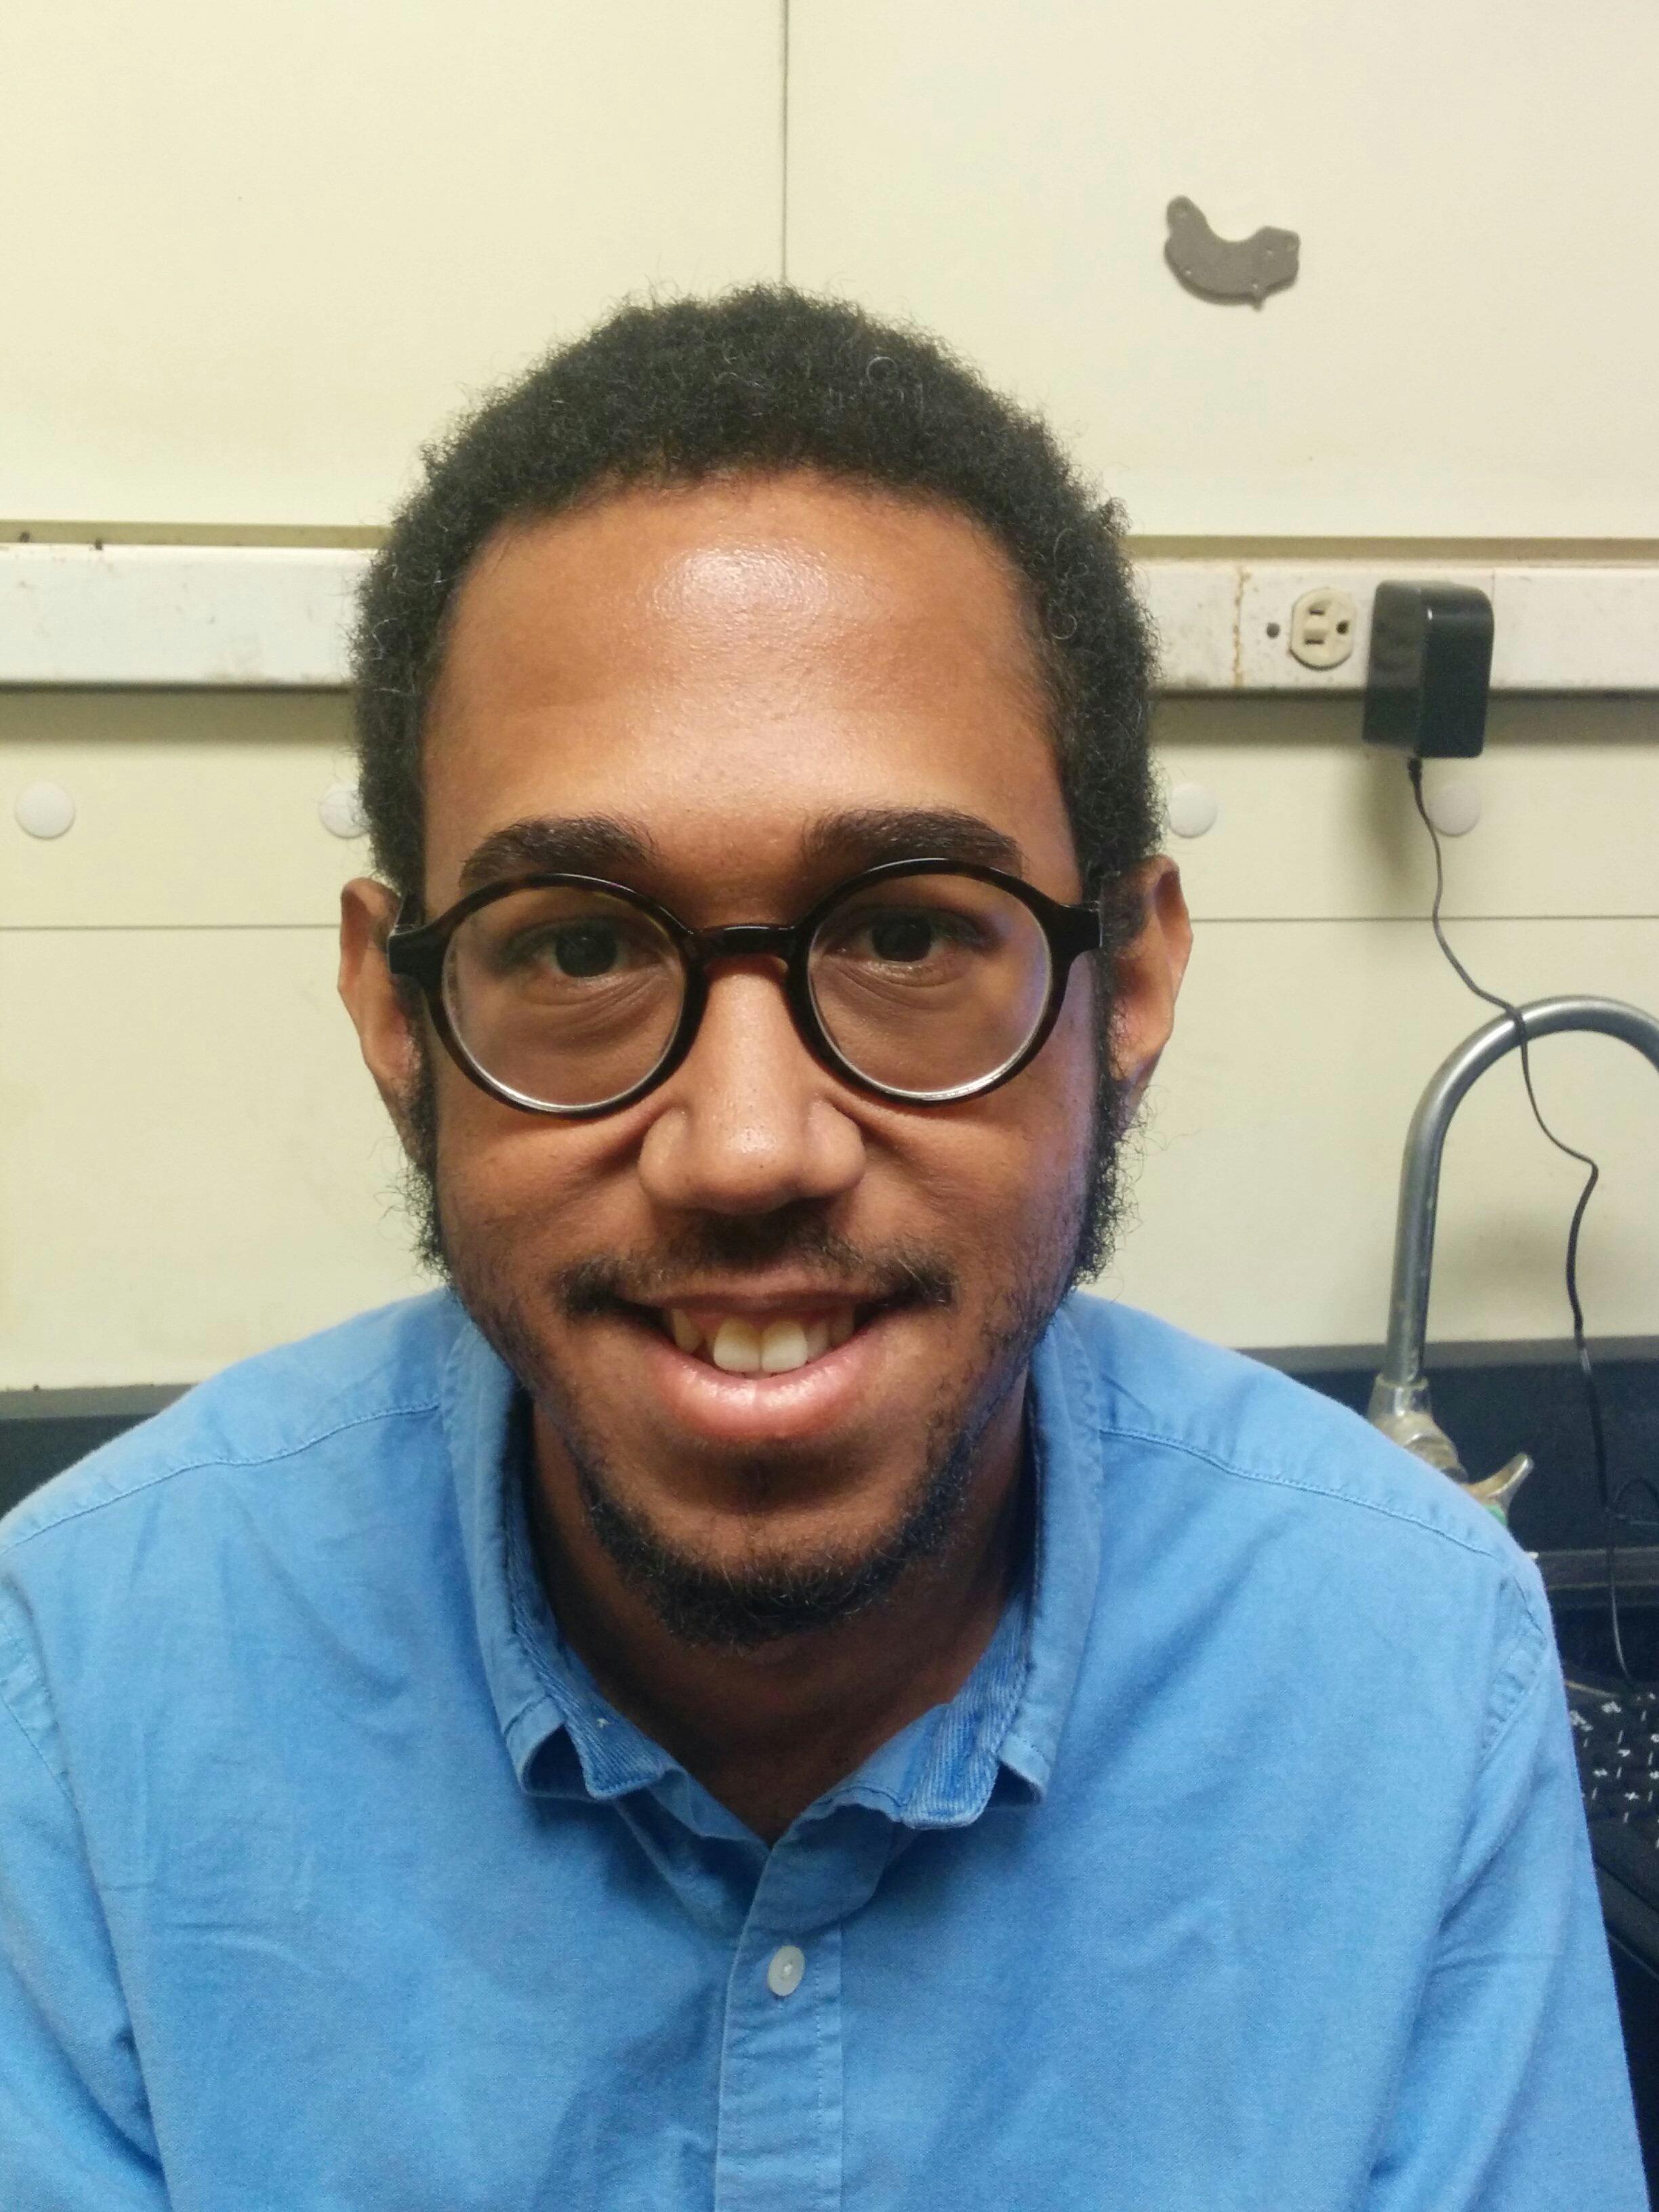 Under the Lens: Abdel Halloway